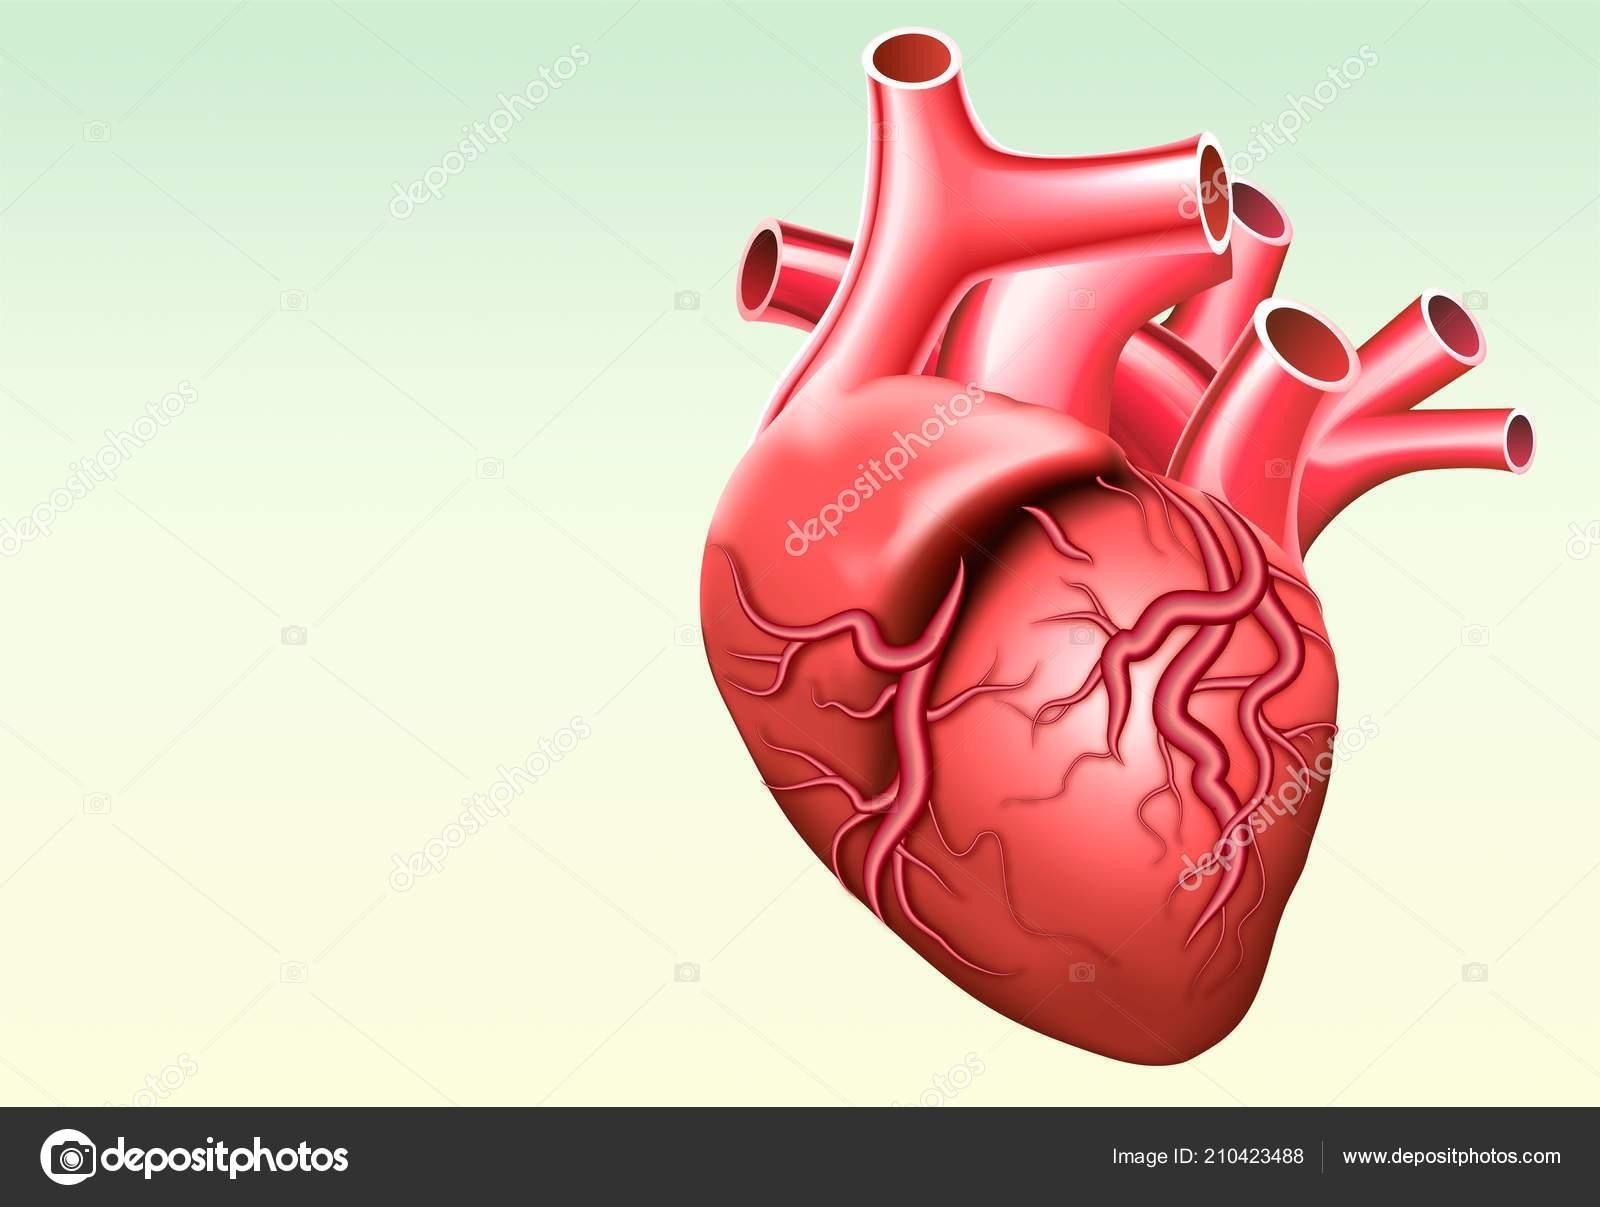 Human Heart Anatomy Healthcare Medicine Human Internal Organ Vector